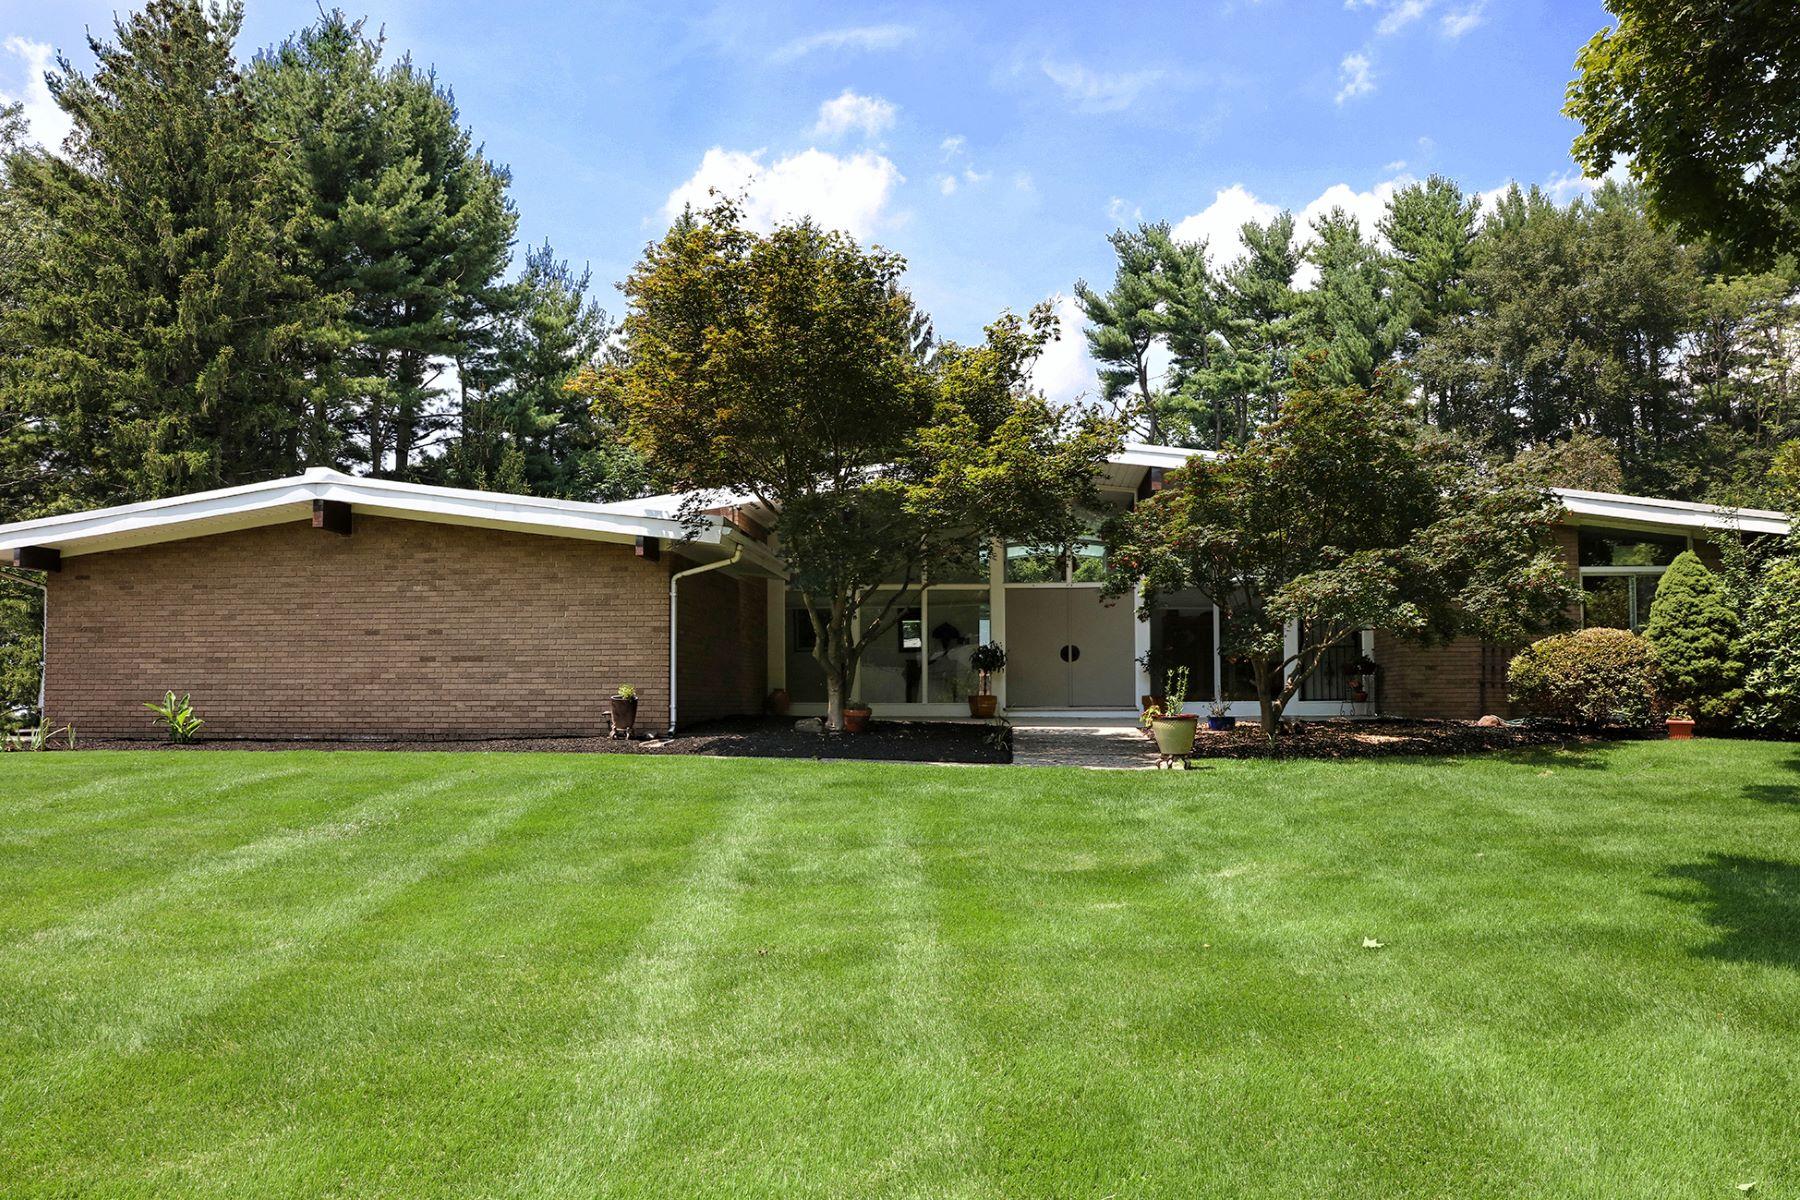 独户住宅 为 销售 在 Frank Lloyd Wright meets Max Breuer - Hopewell Township 5 Forrest Edge Drive 泰特斯维尔, 新泽西州, 08560 美国